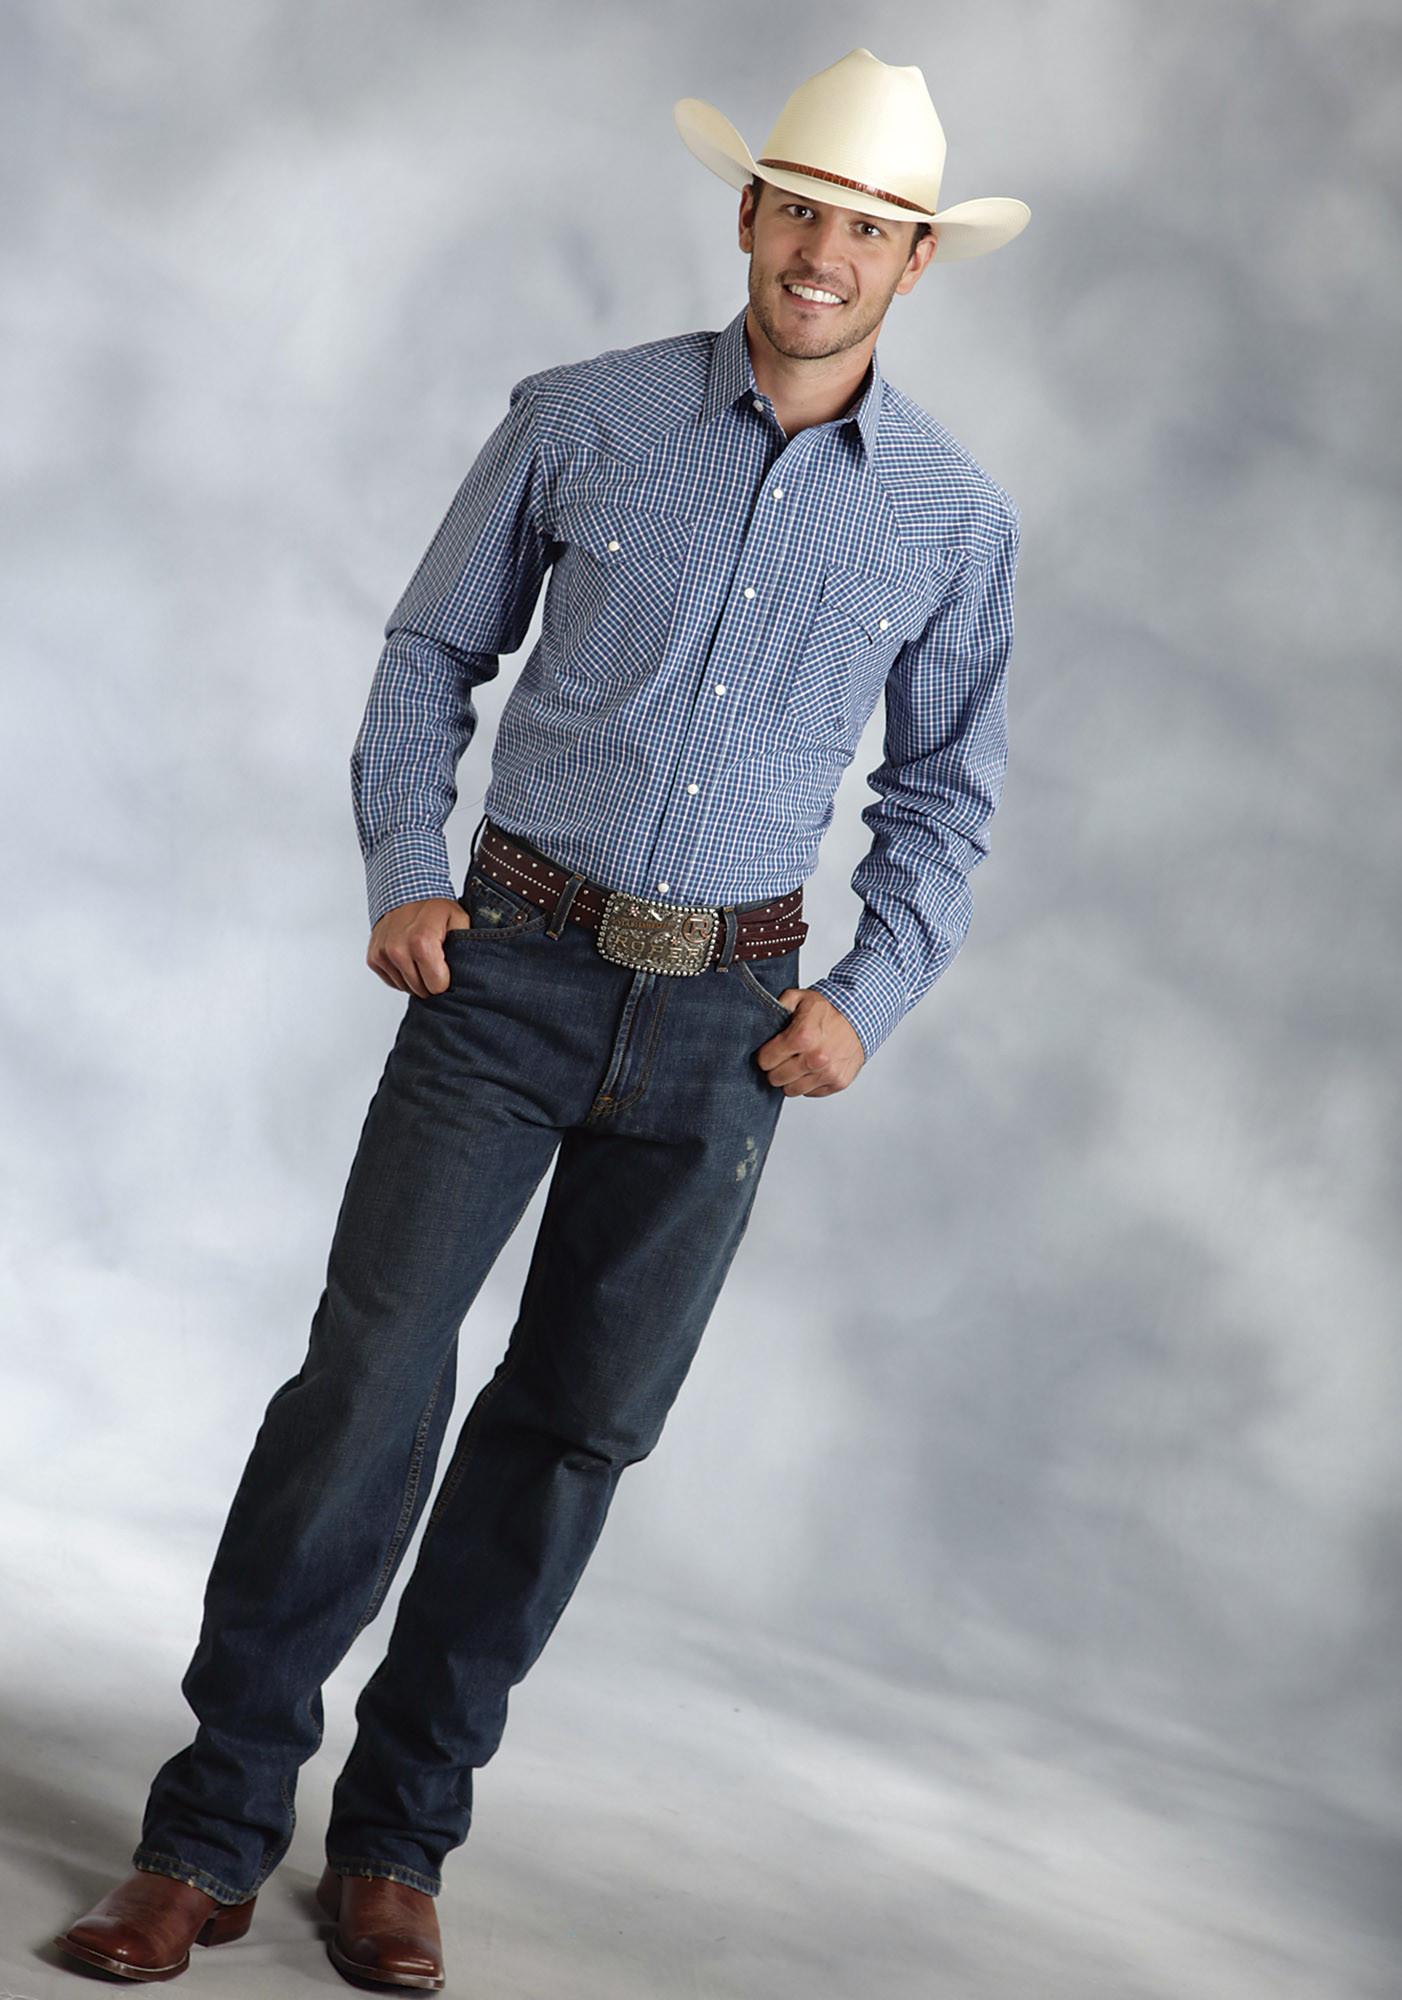 Details about  /Roper Western Shirt Mens L//S Solid Snap 2XL Blue 03-001-0185-0322 BU